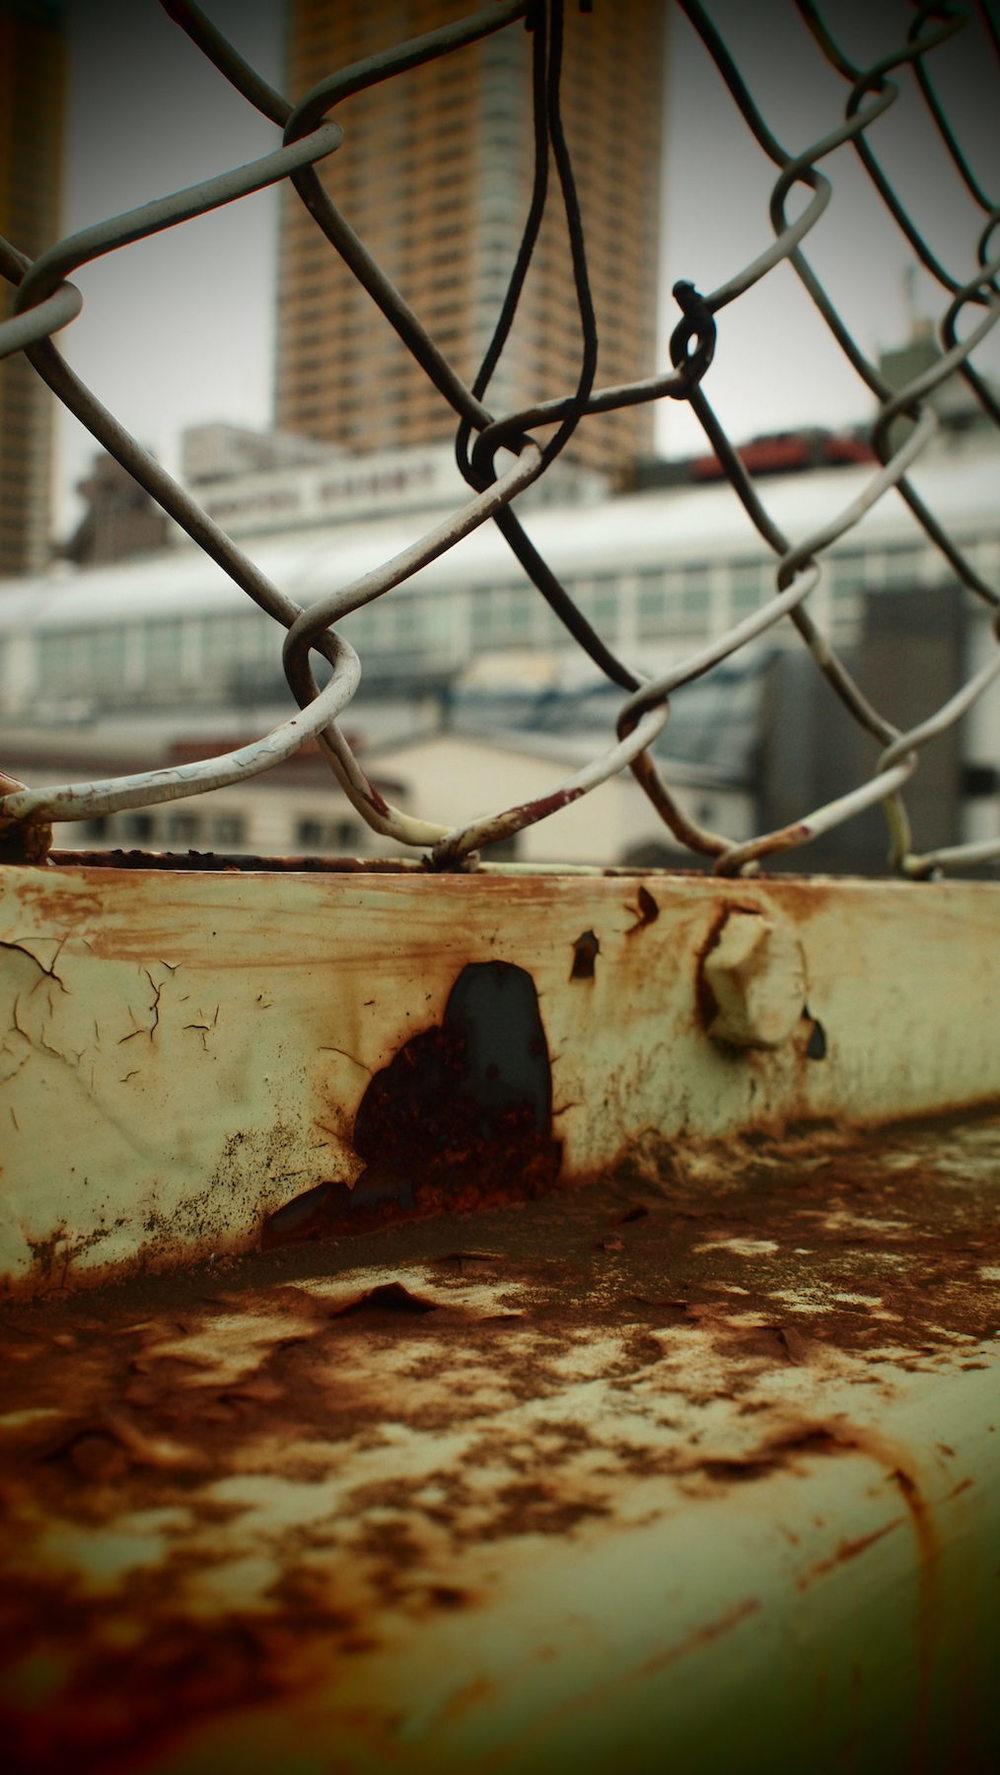 Fence.  Taken near Nippori Station, Tokyo.